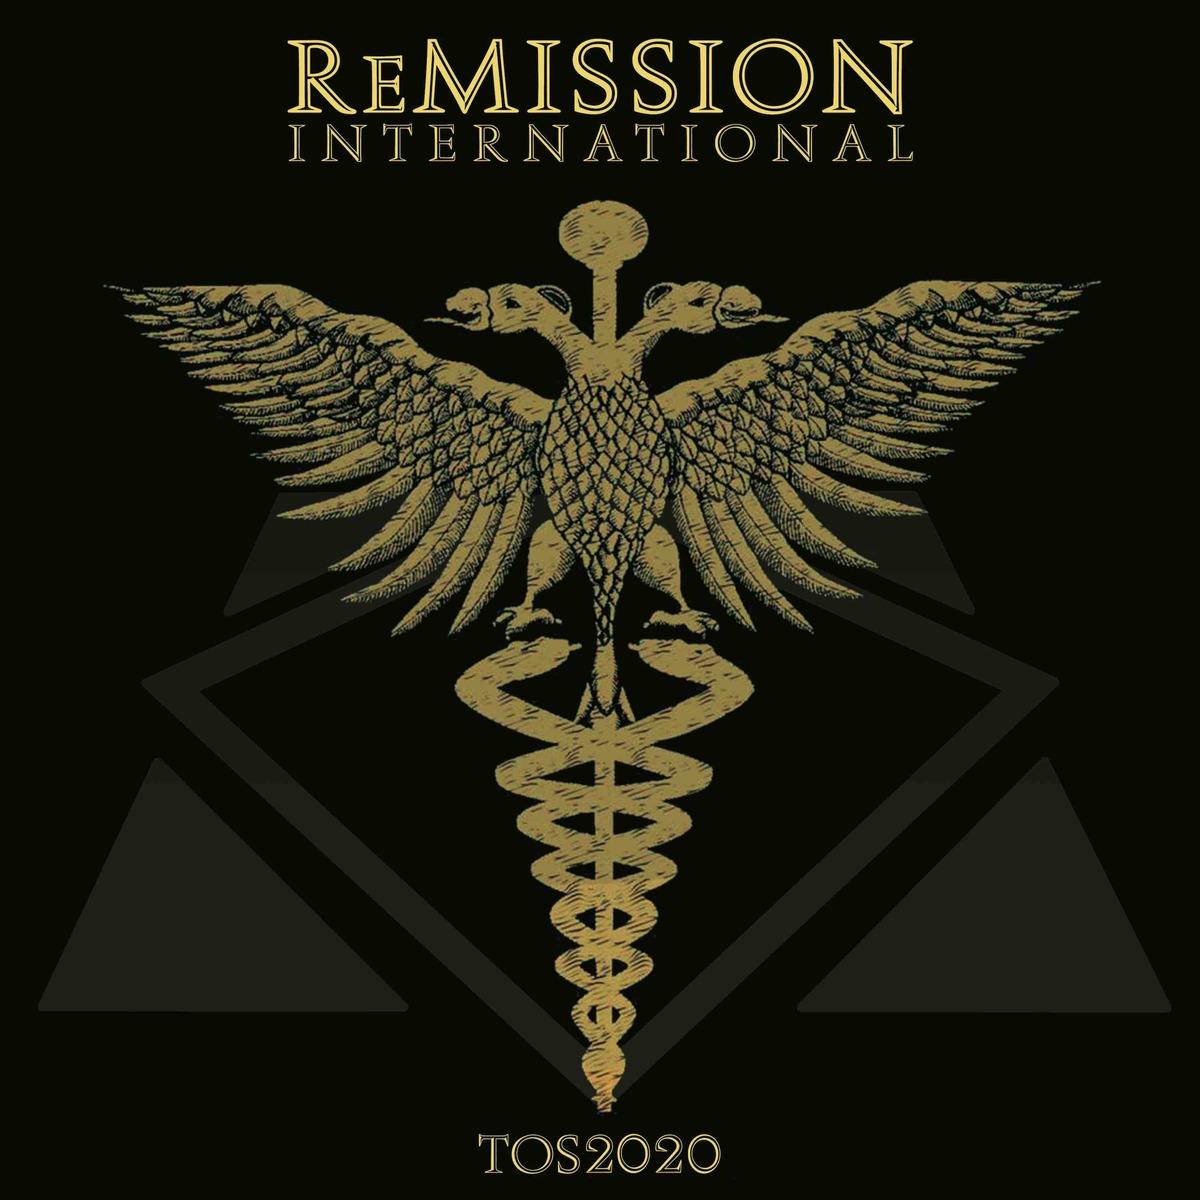 ReMission International,